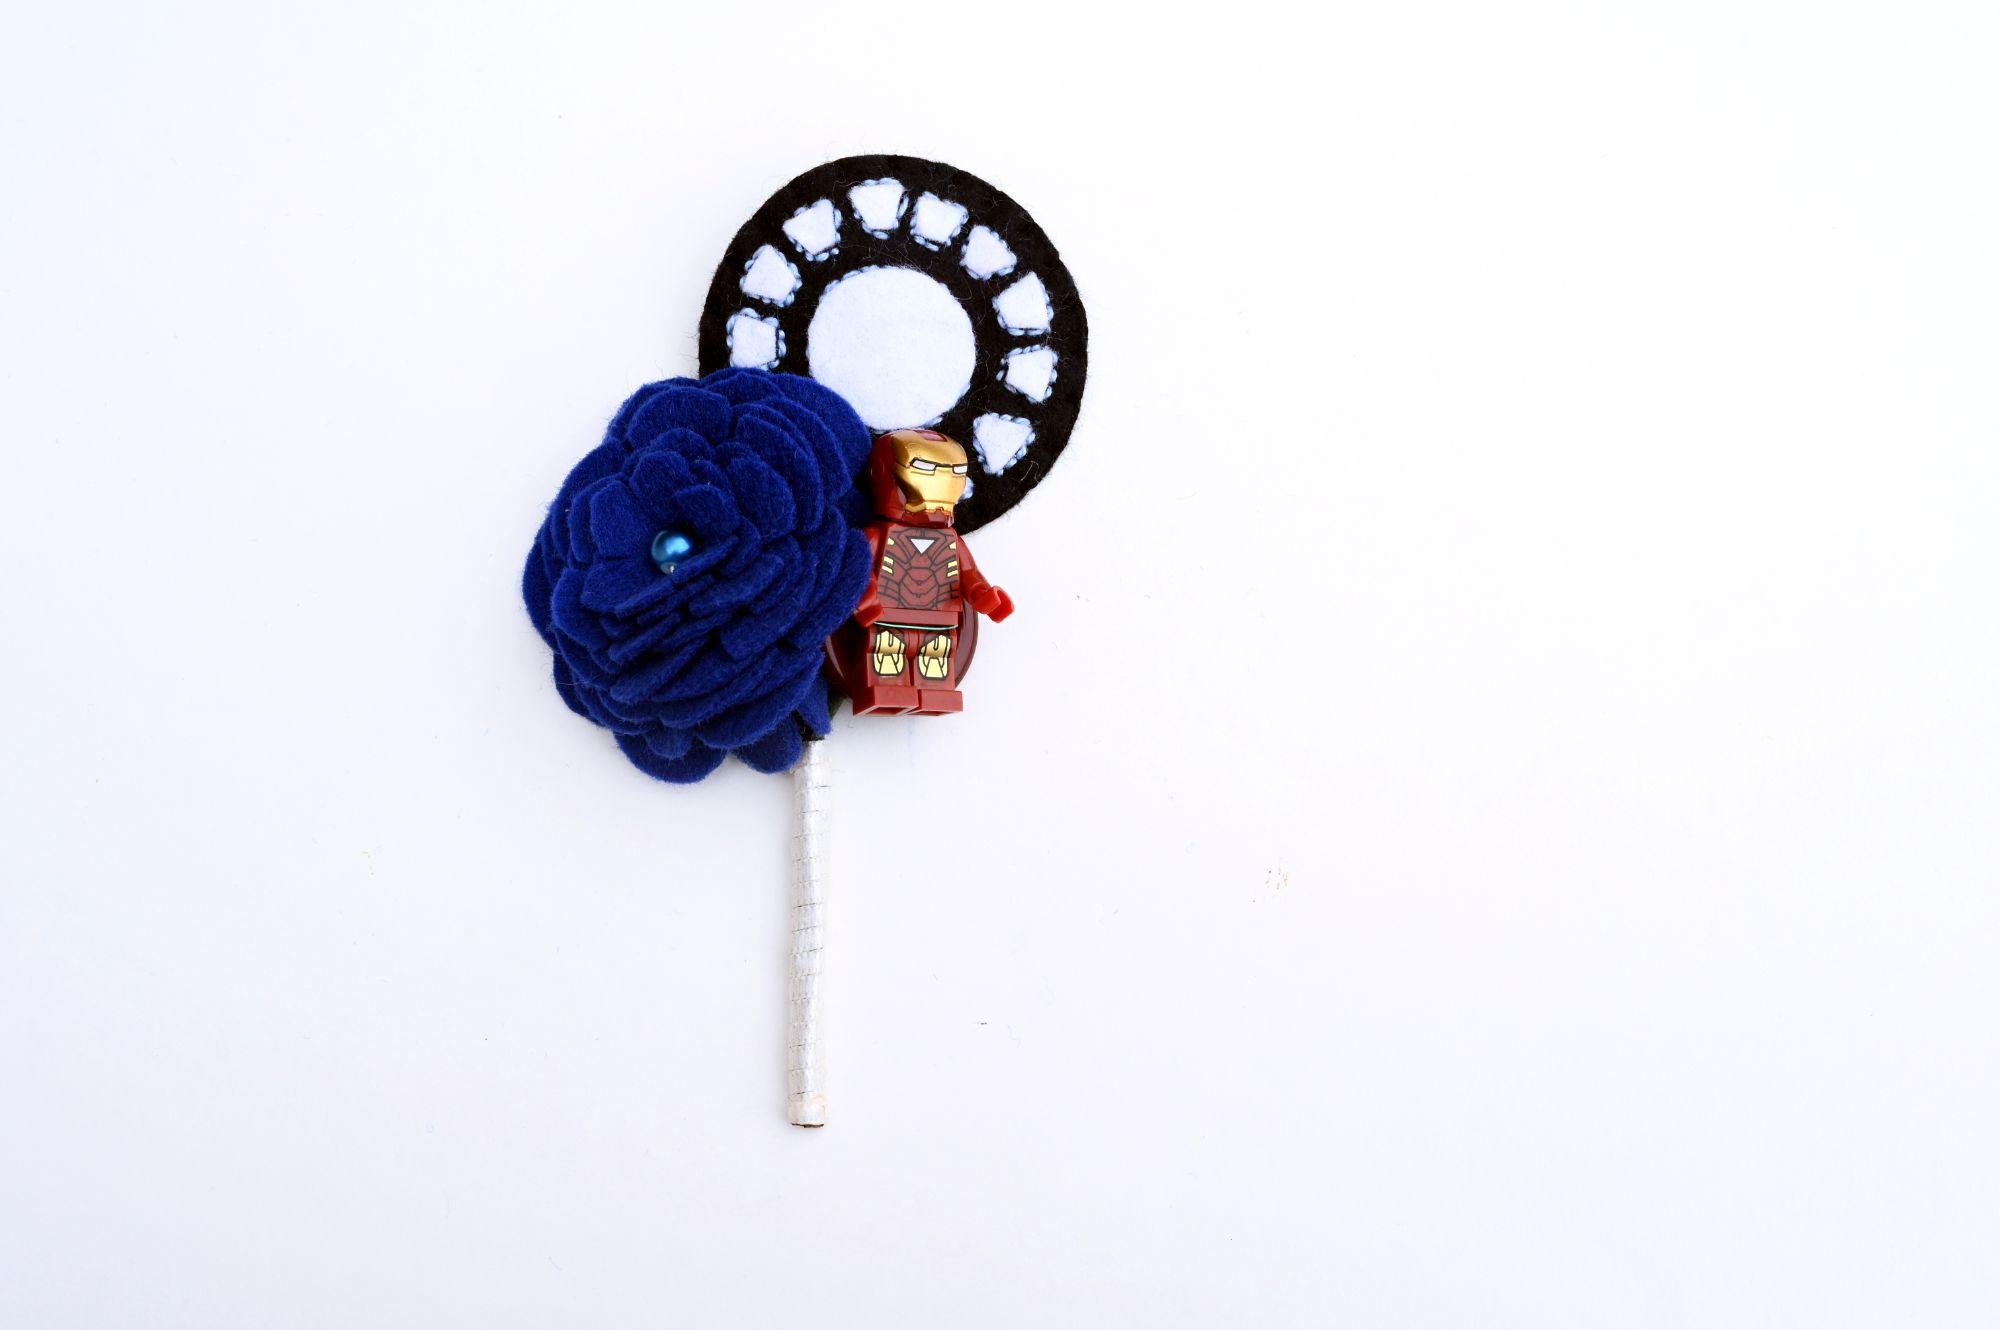 Iron man lego buttonhole